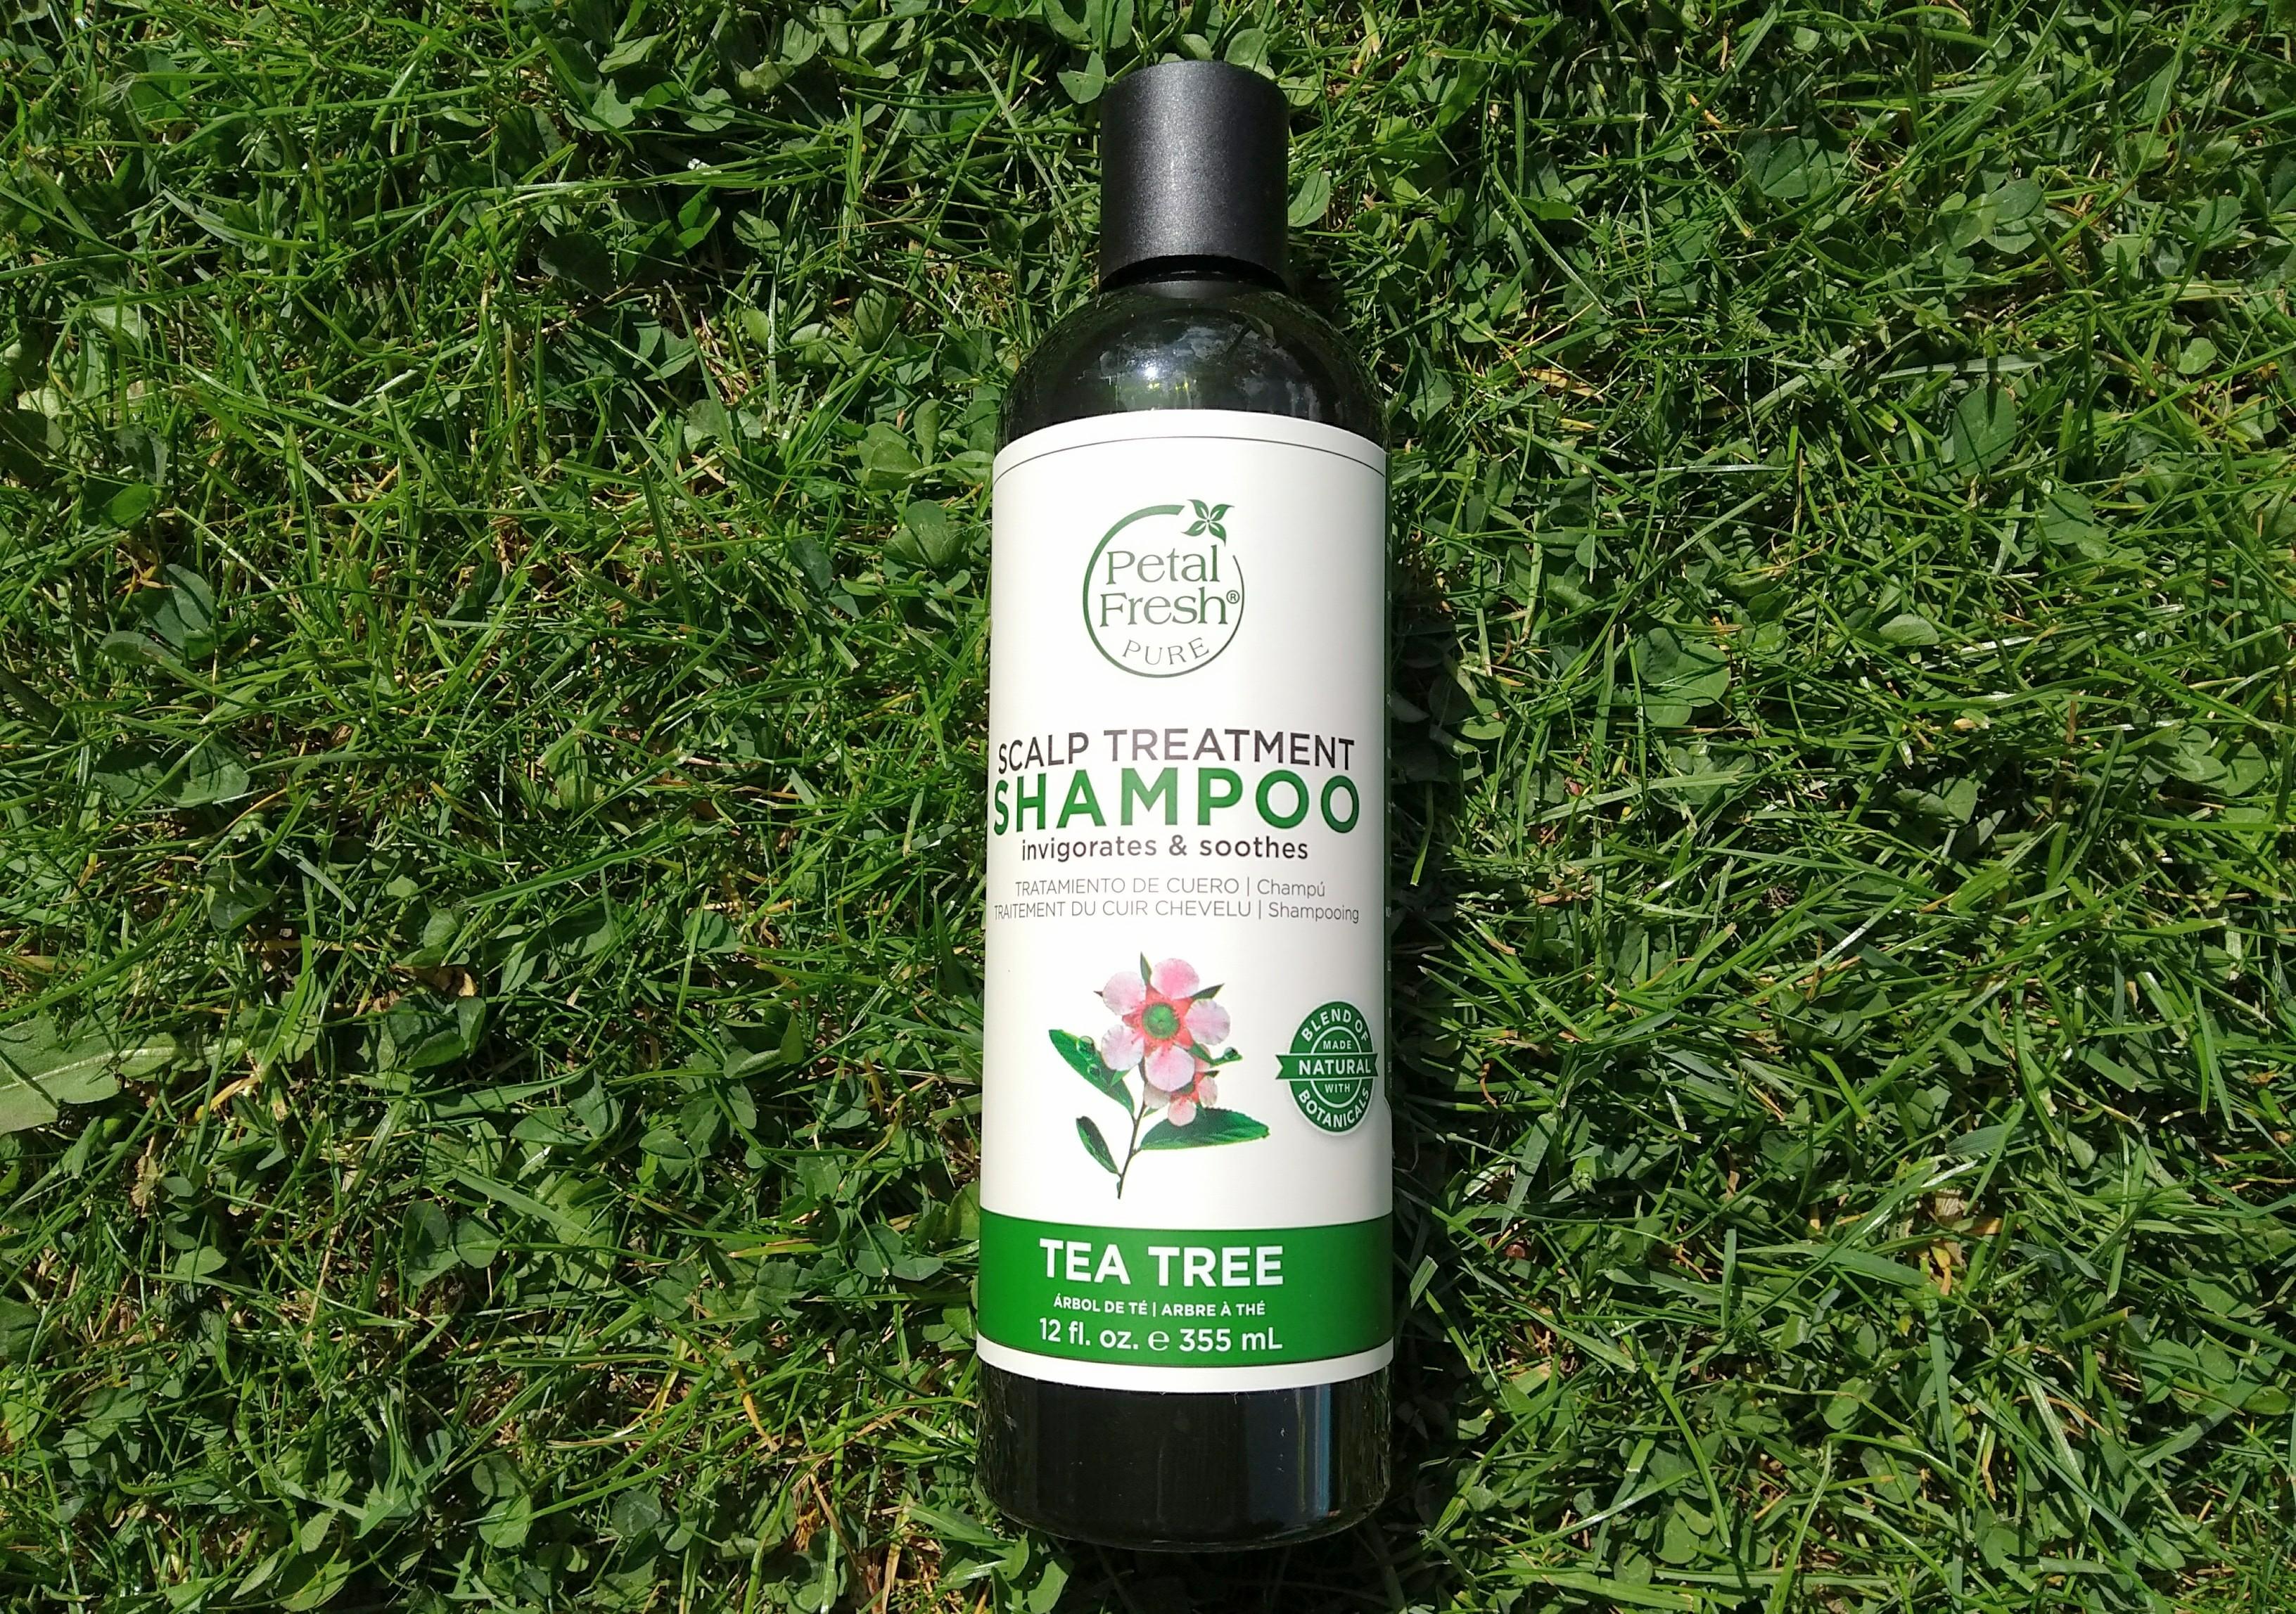 review, petal fresh, petal fresh pure, scalp shampoo, scalp treatment shampoo, shampoo gevoelige hoofdhuid, gevoelige hoofdhuid, vegan shampoo, tea tree shampoo, shampoo gestest, mamablog, blog, mamalifestyle, haar, haar wassen, lalogblog, lalog.nl